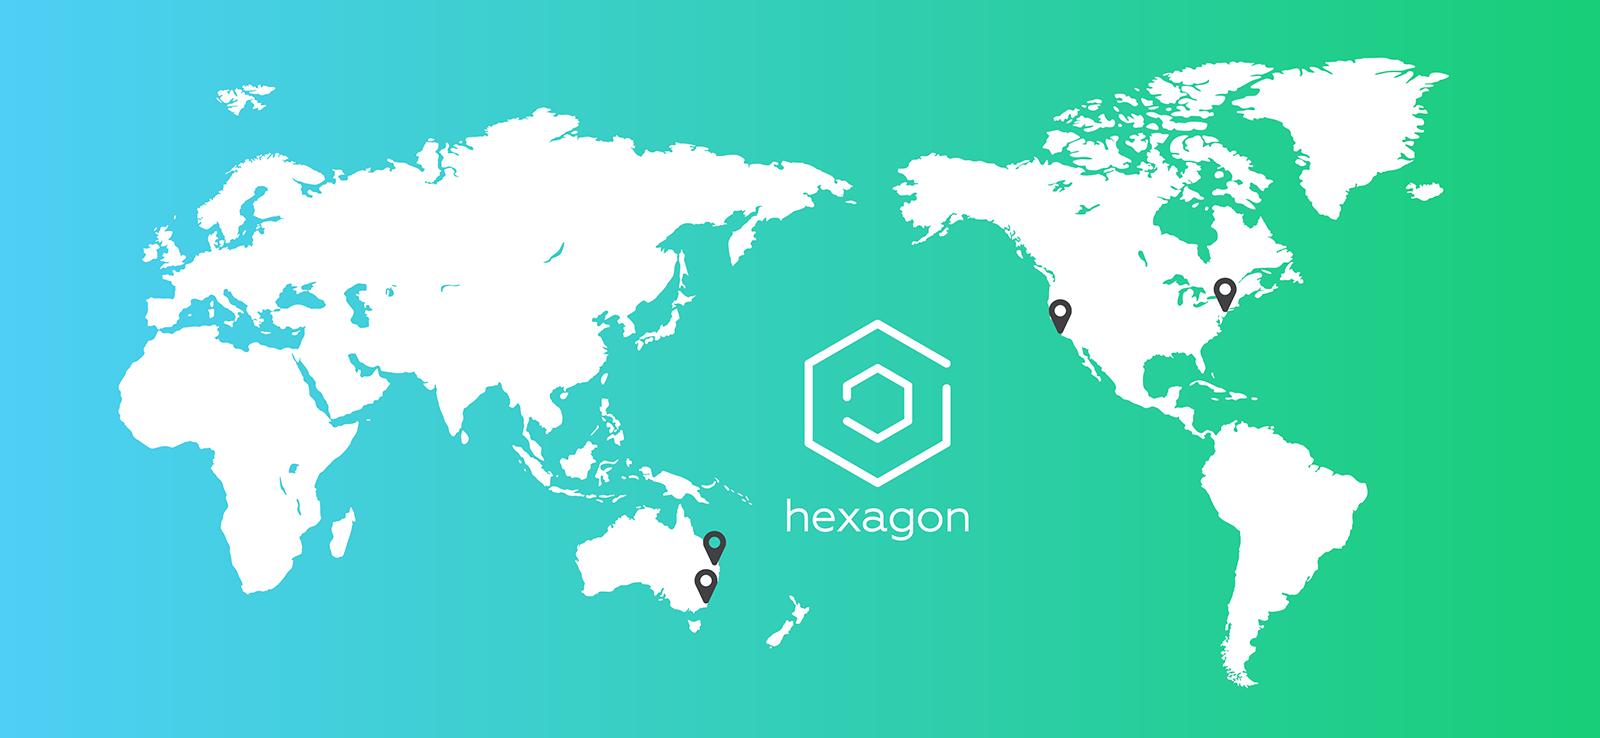 hexagon_worldmap.png